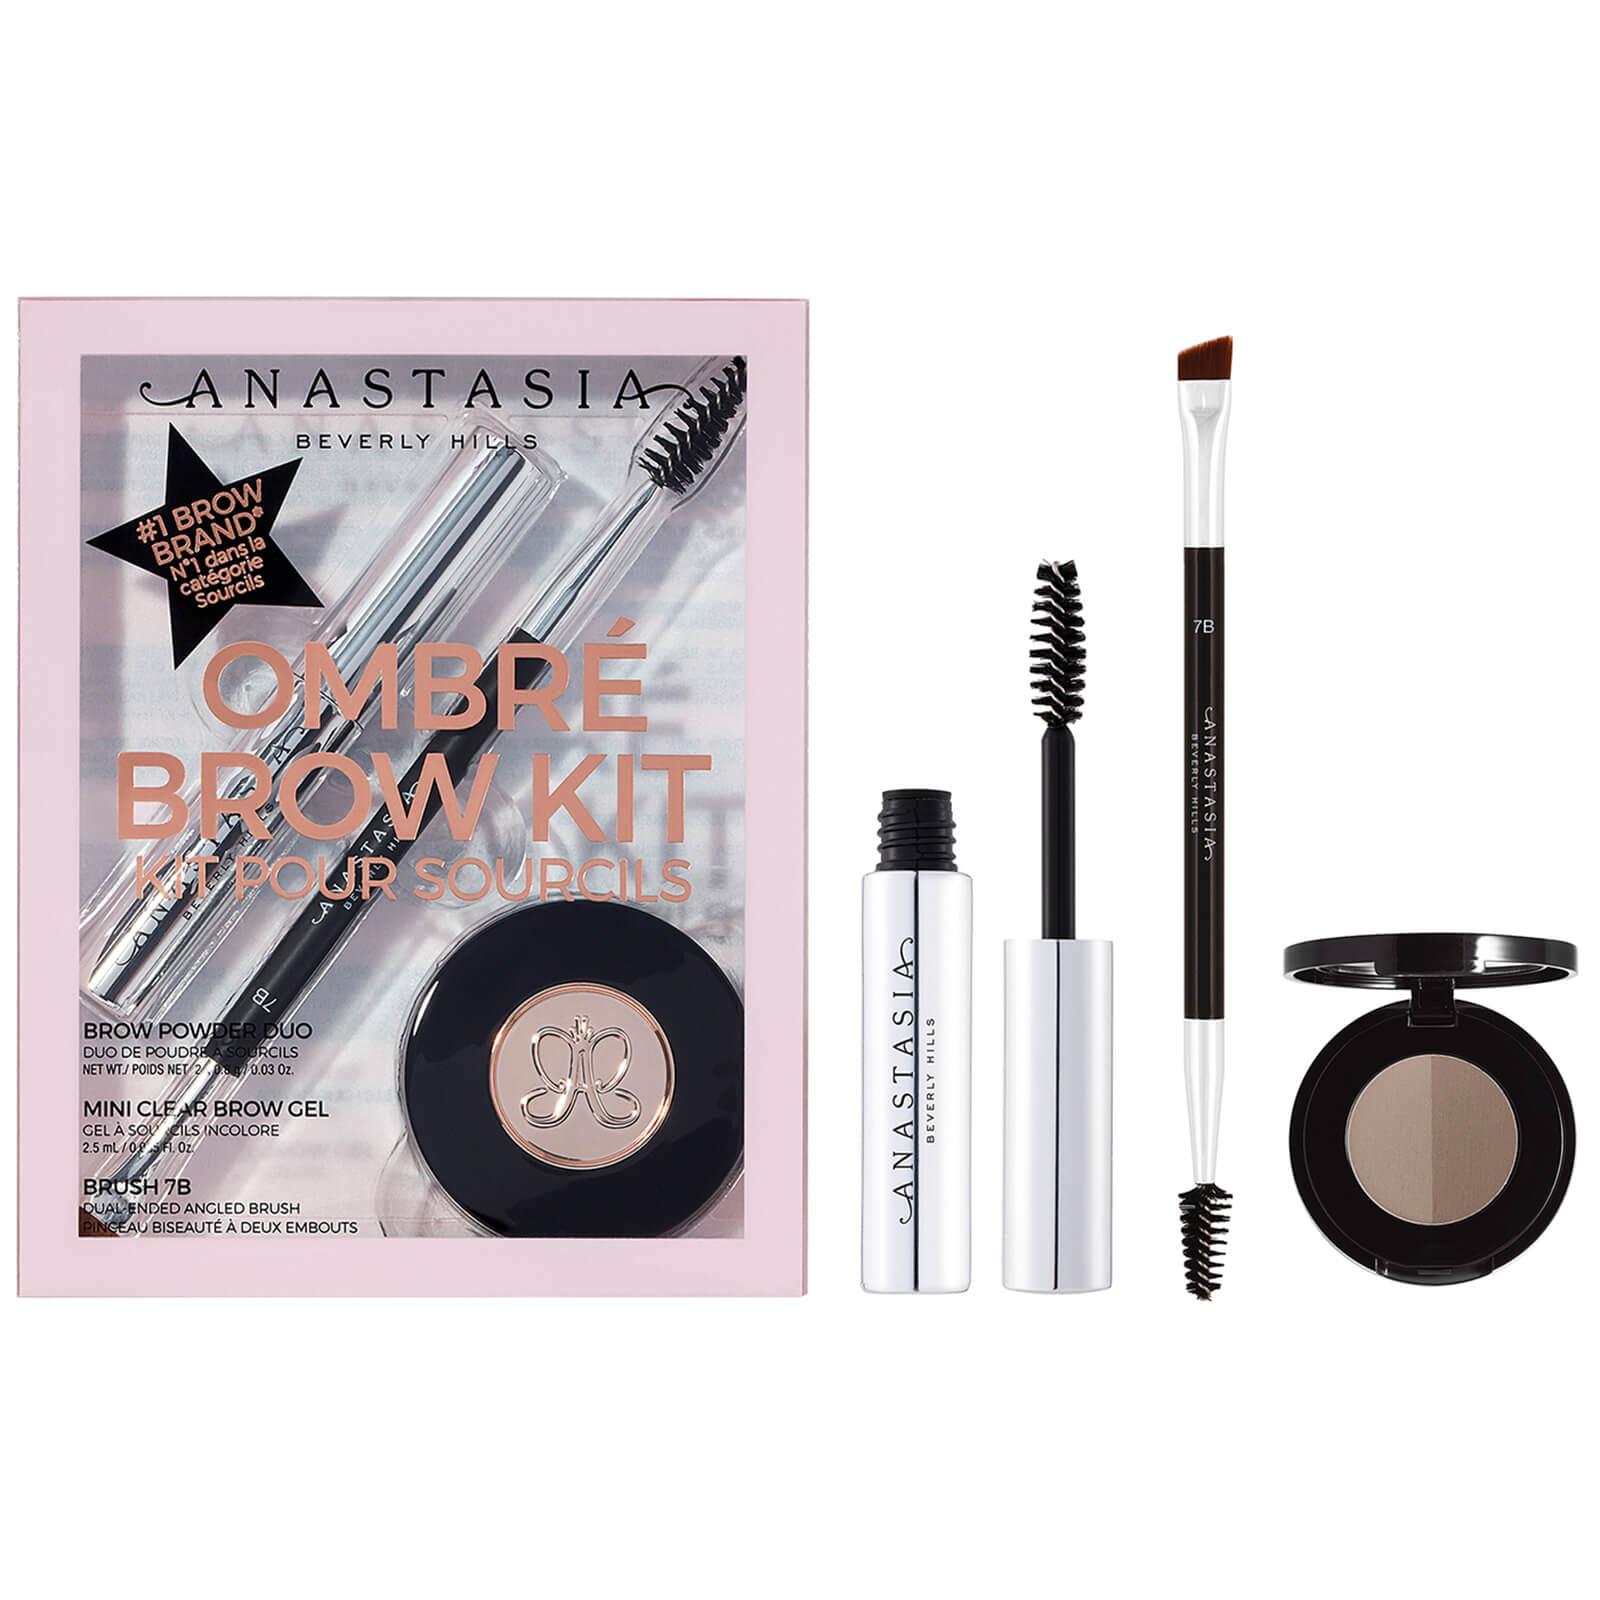 Anastasia Beverly Hills Brow Kit #3 Ombre Brow Kit 8.97g (Various Shades) - Medium Brown